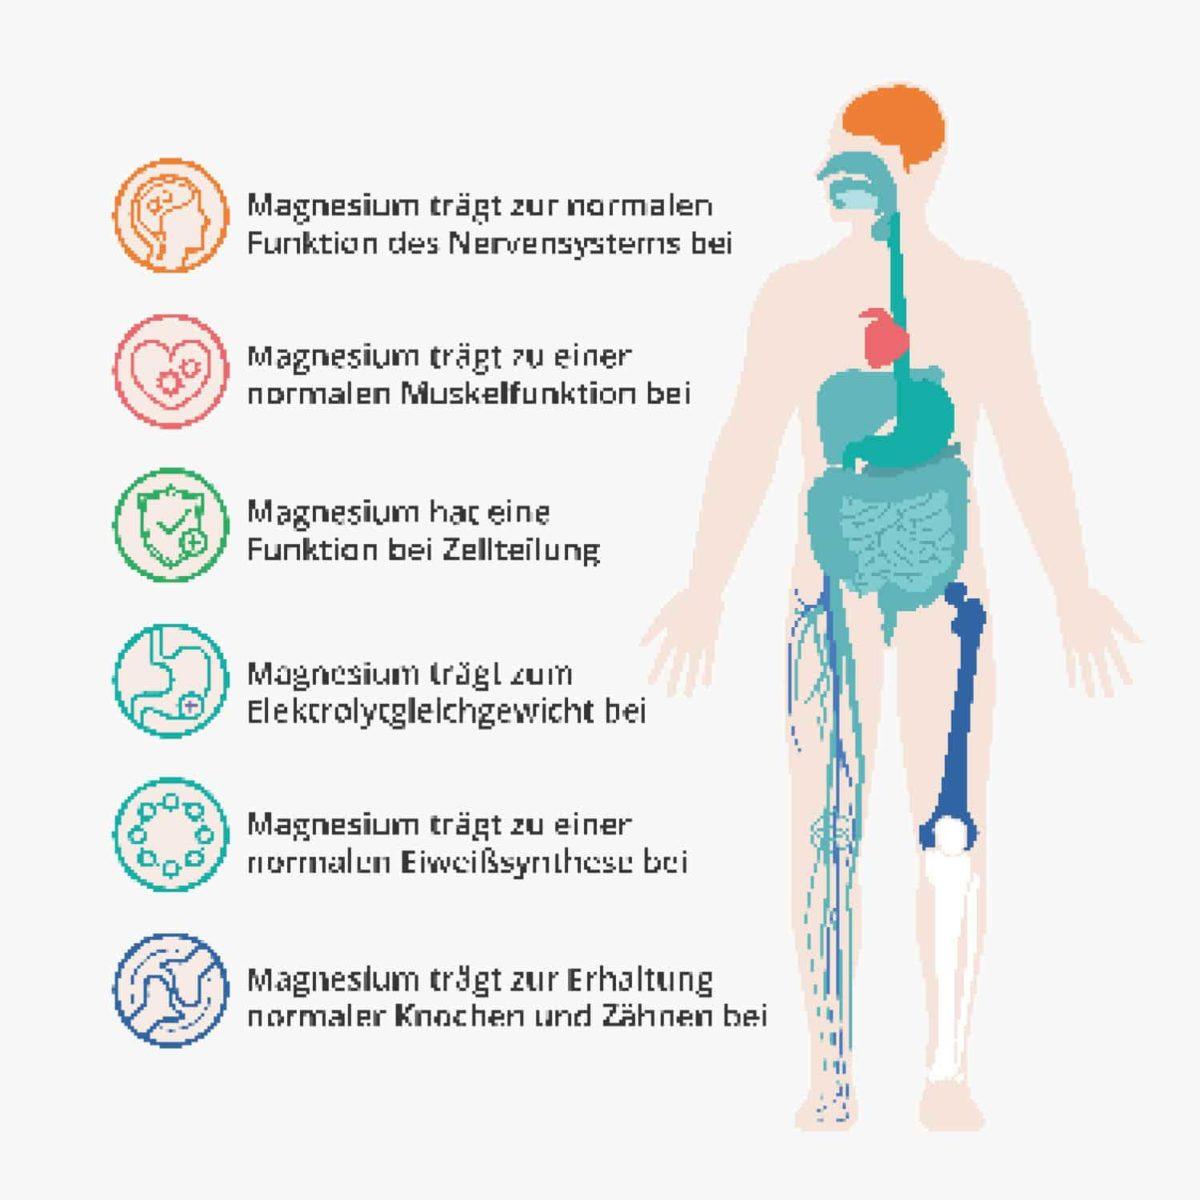 Magnesium Glycinate Capsules Vital – 120 Stk. 14362480 PZN Apotheke Bioverfügbarkeit organisches Magnesium3